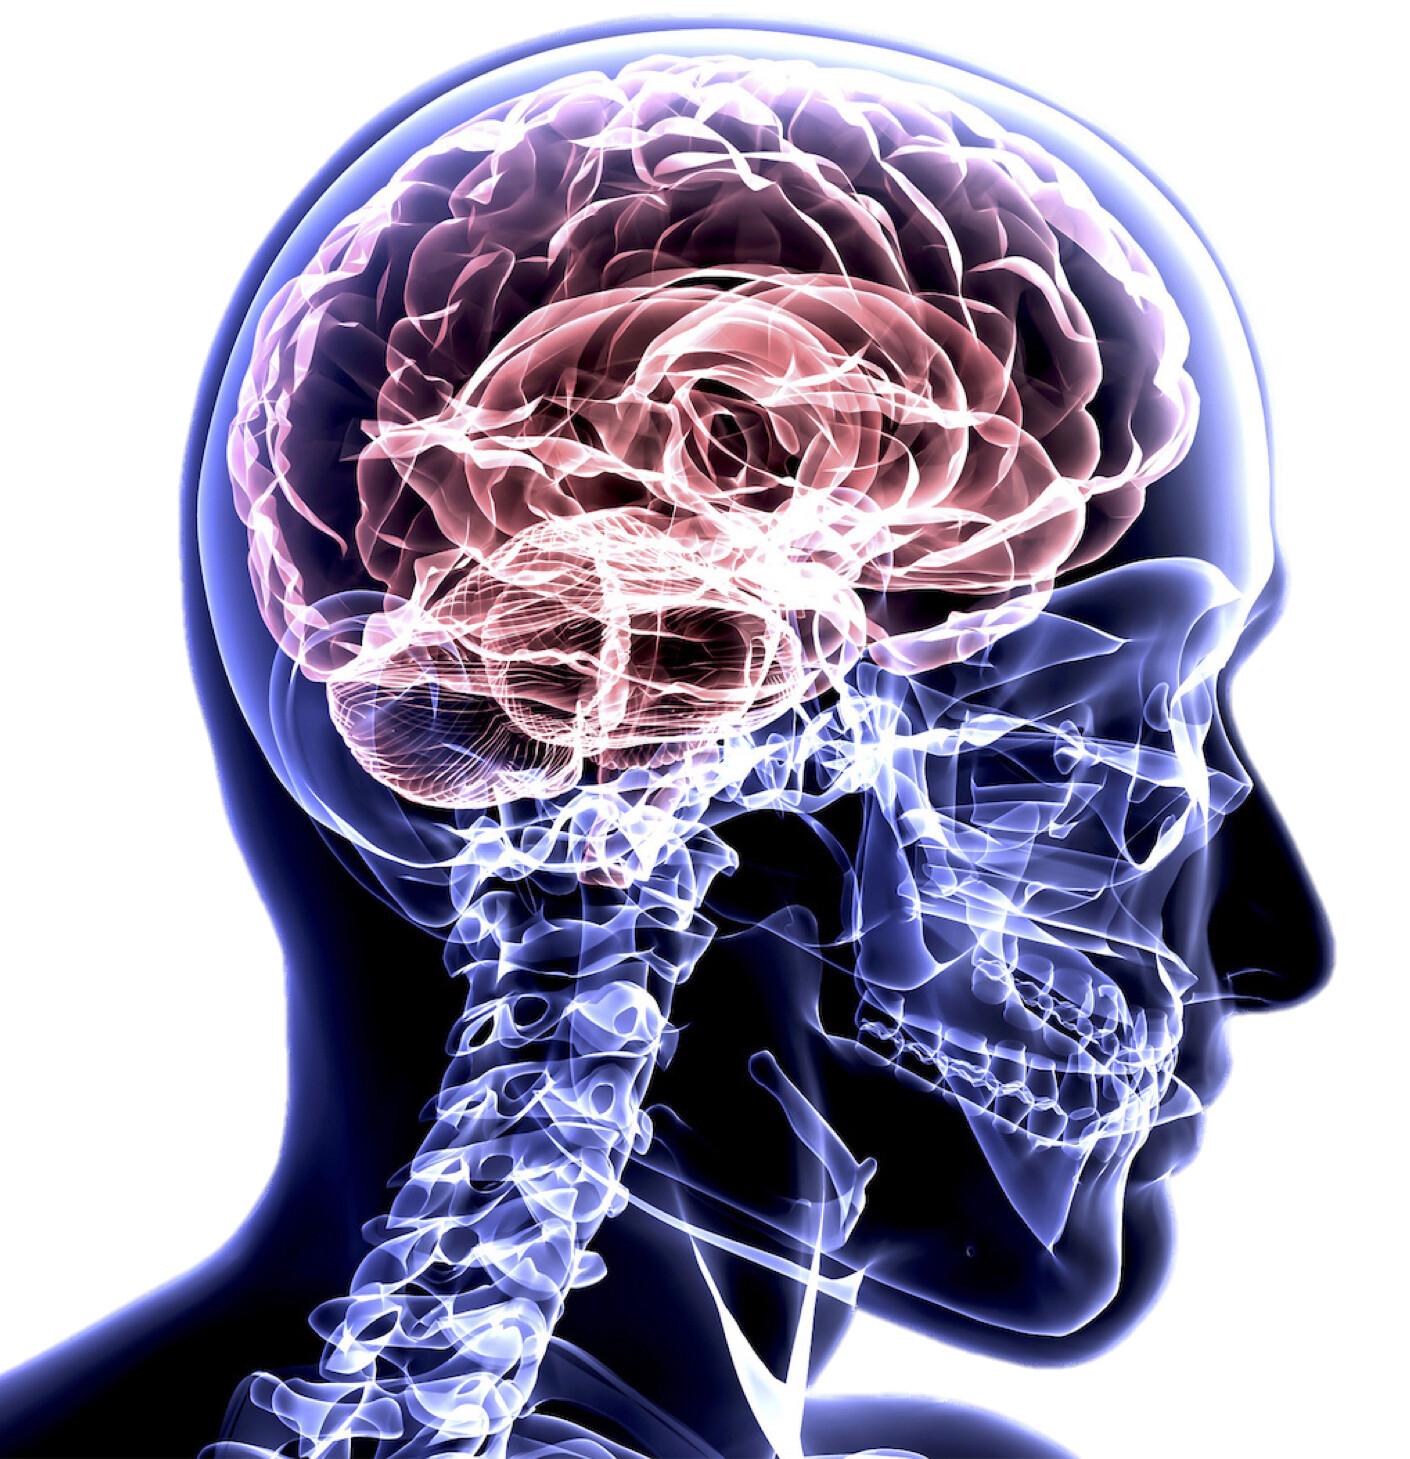 National Undergraduate Neuroanatomy Competition 2021